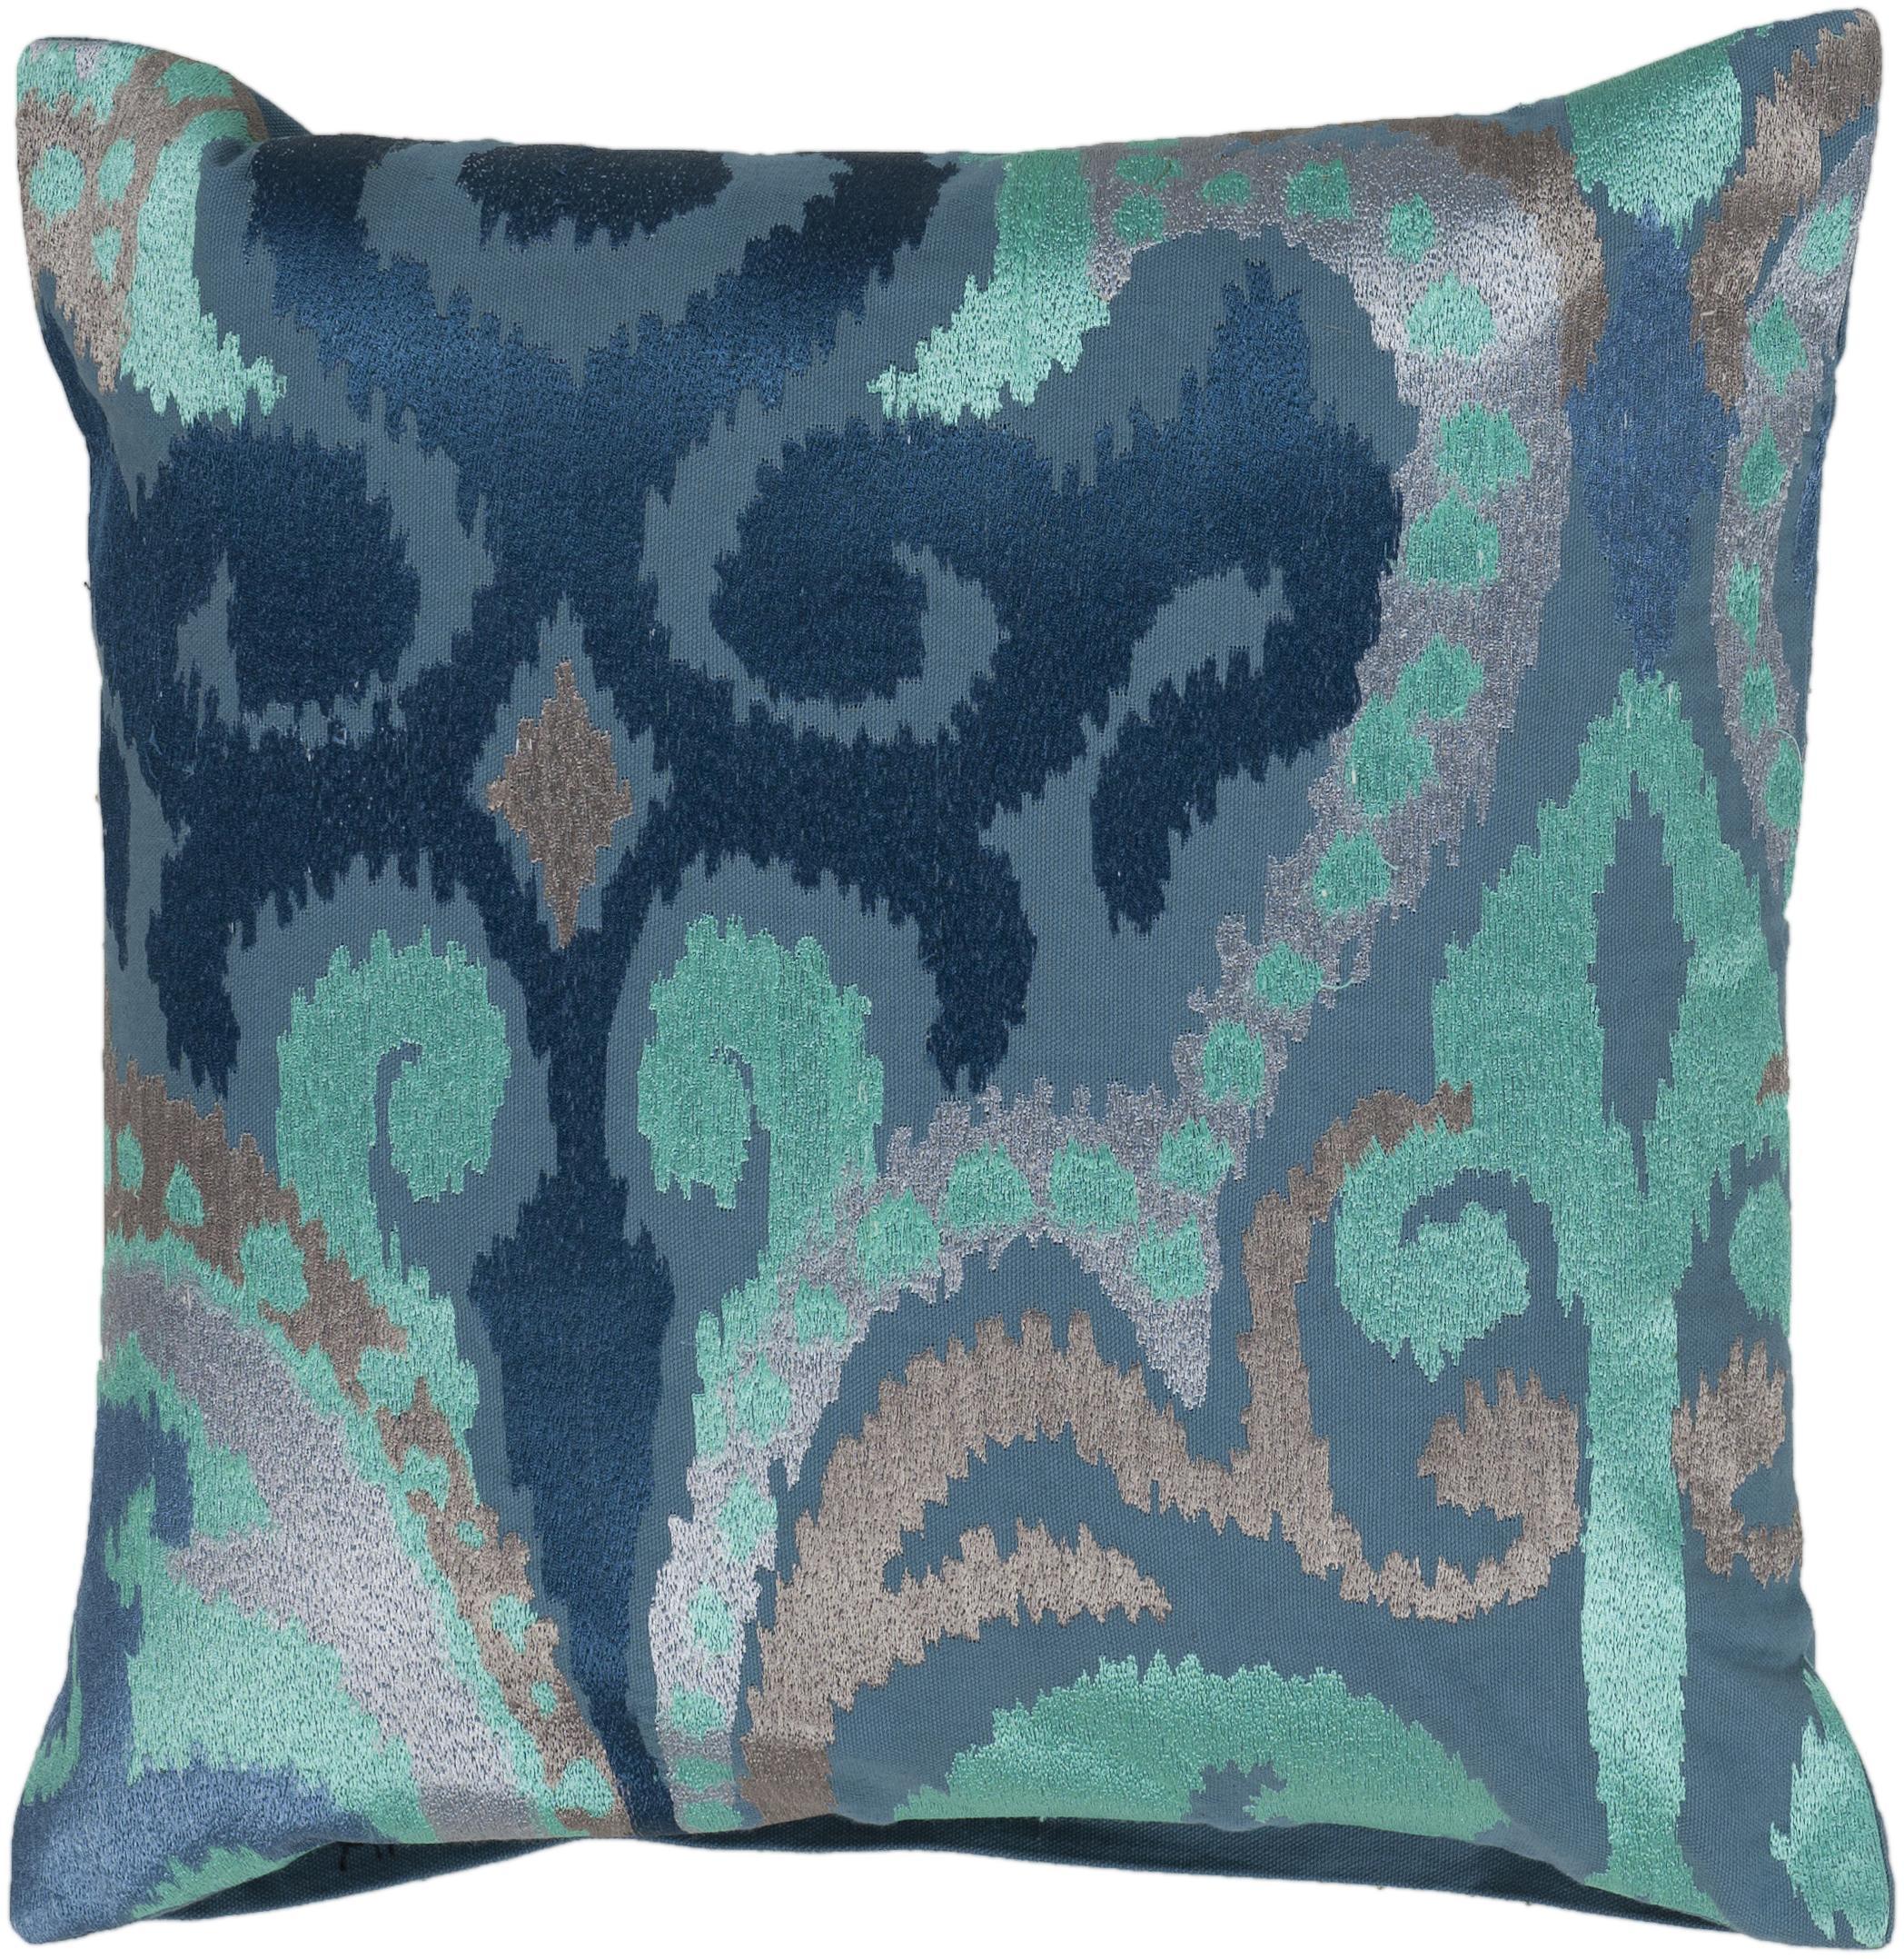 "Pillows 18"" x 18"" Pillow by Surya at Suburban Furniture"